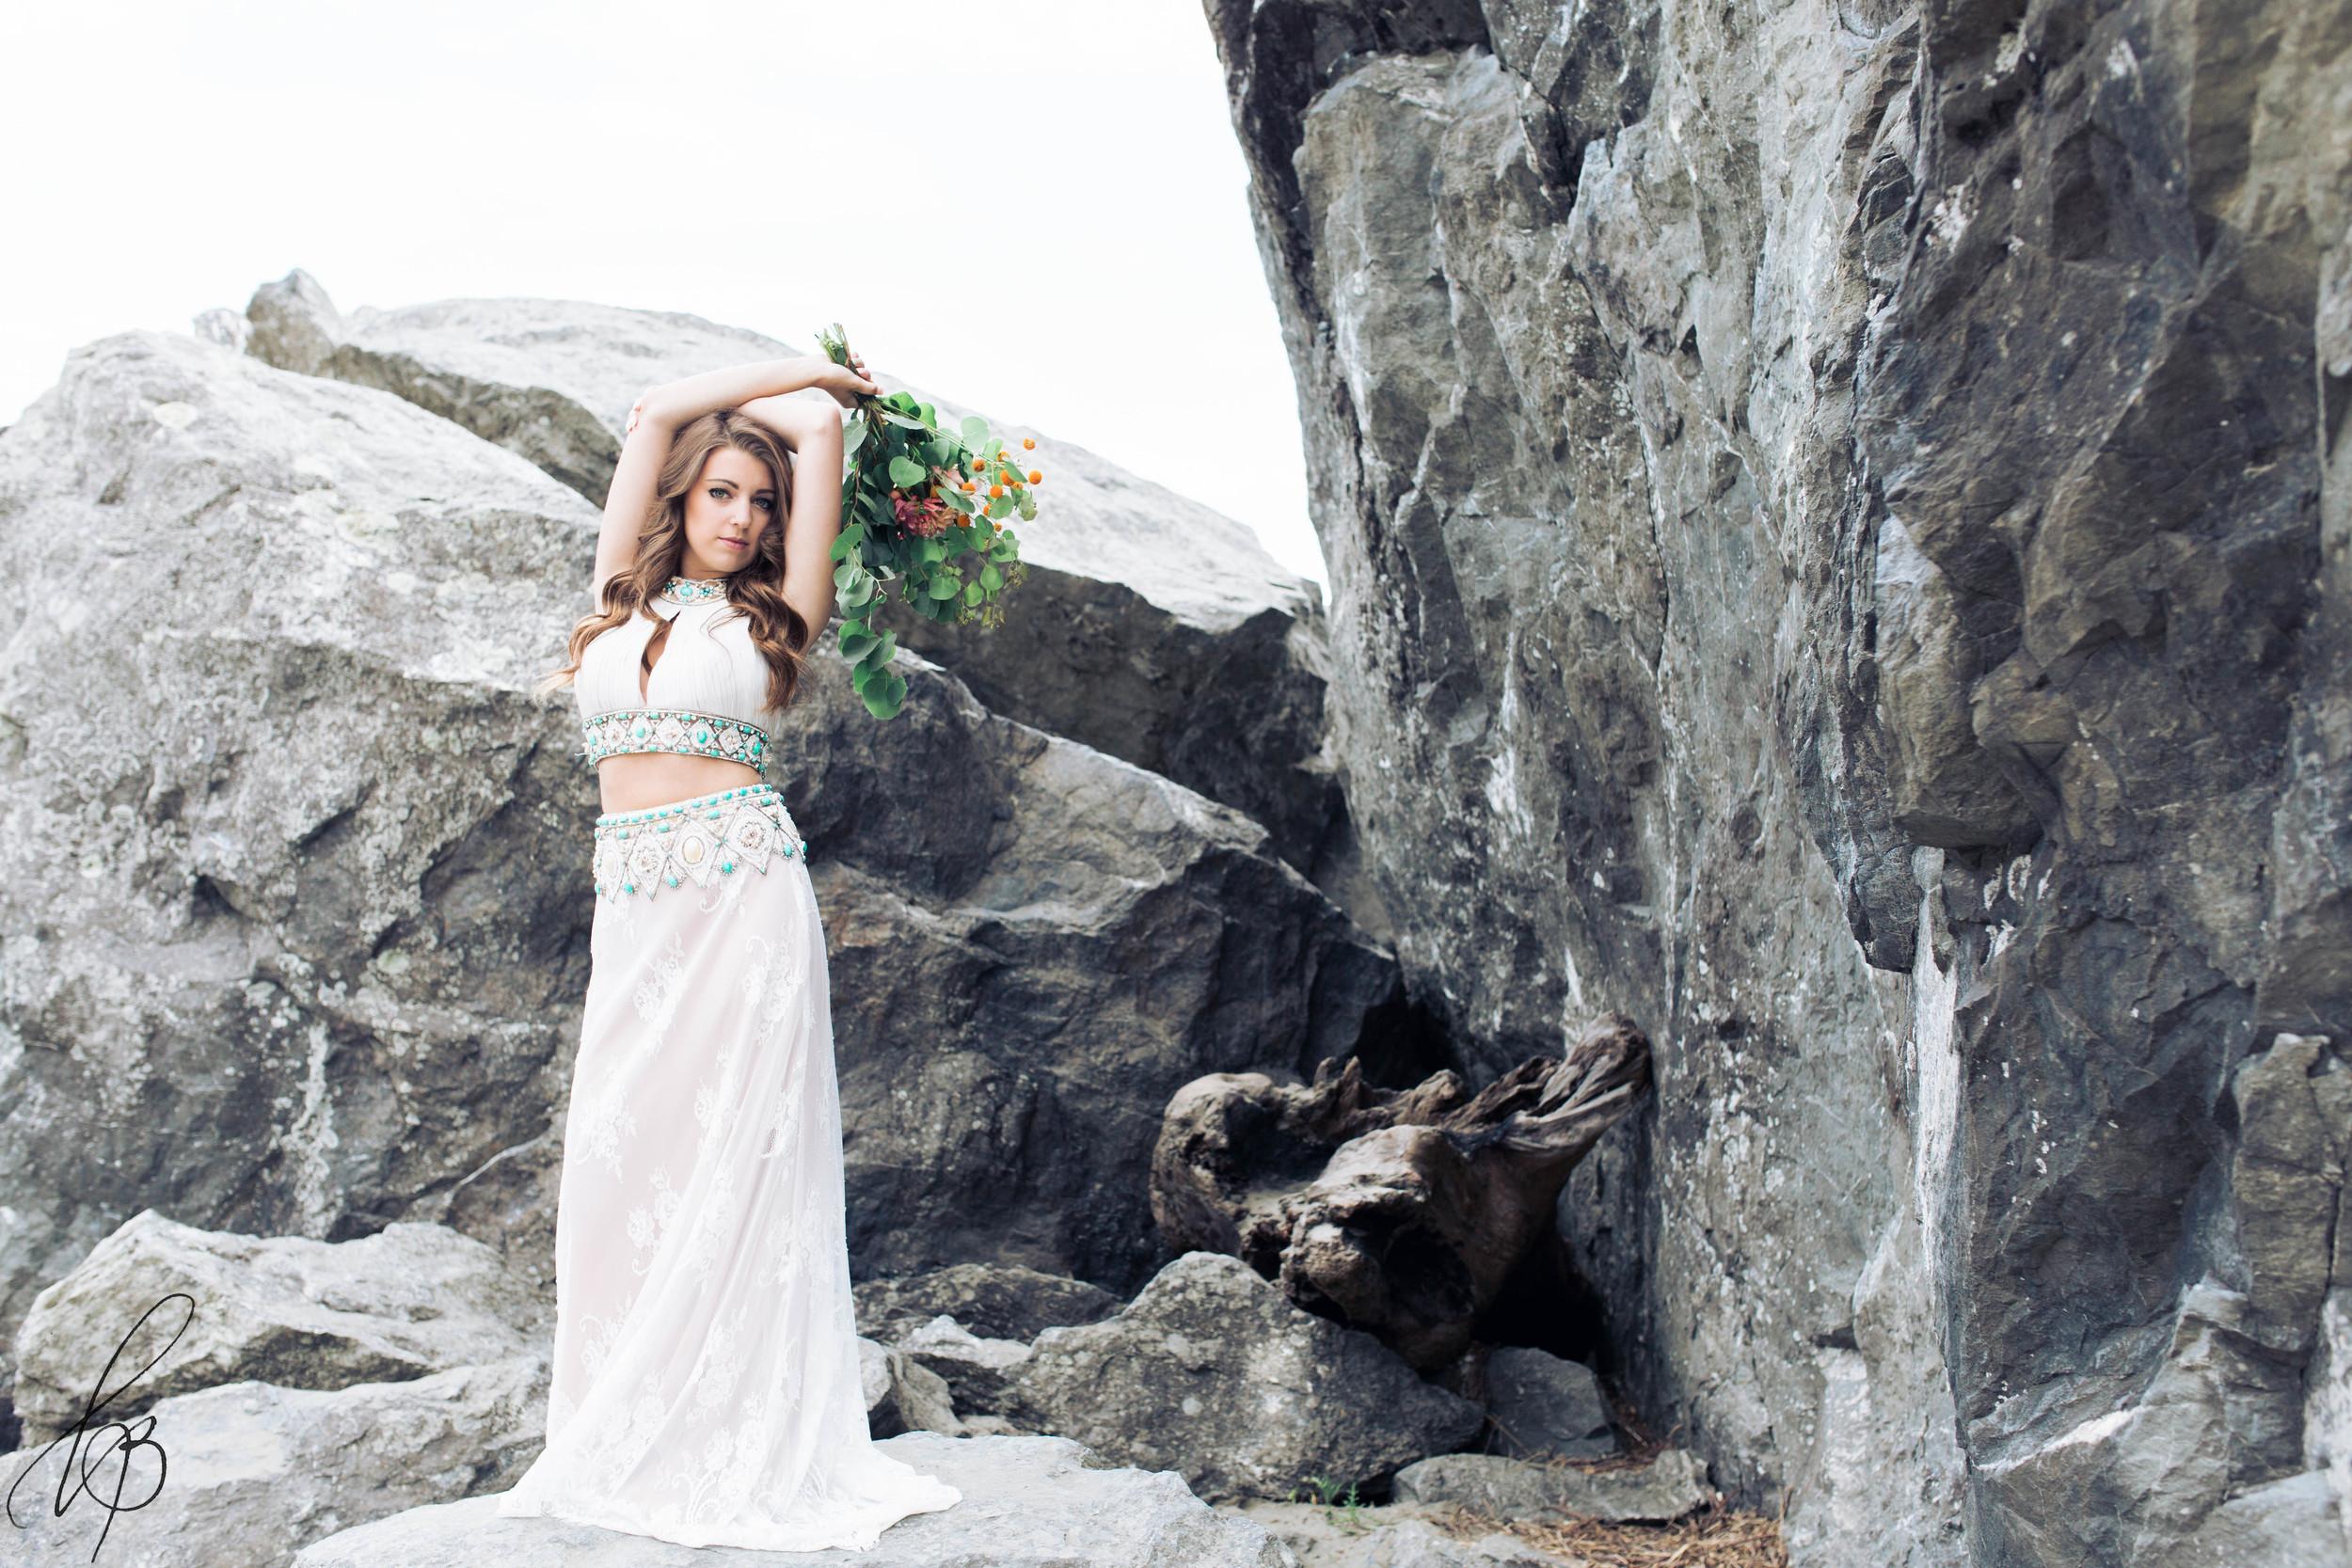 Lubbock-texas-wedding-fashion-lifestyle-fine-art-photographer-west-texas-photography-47.jpg